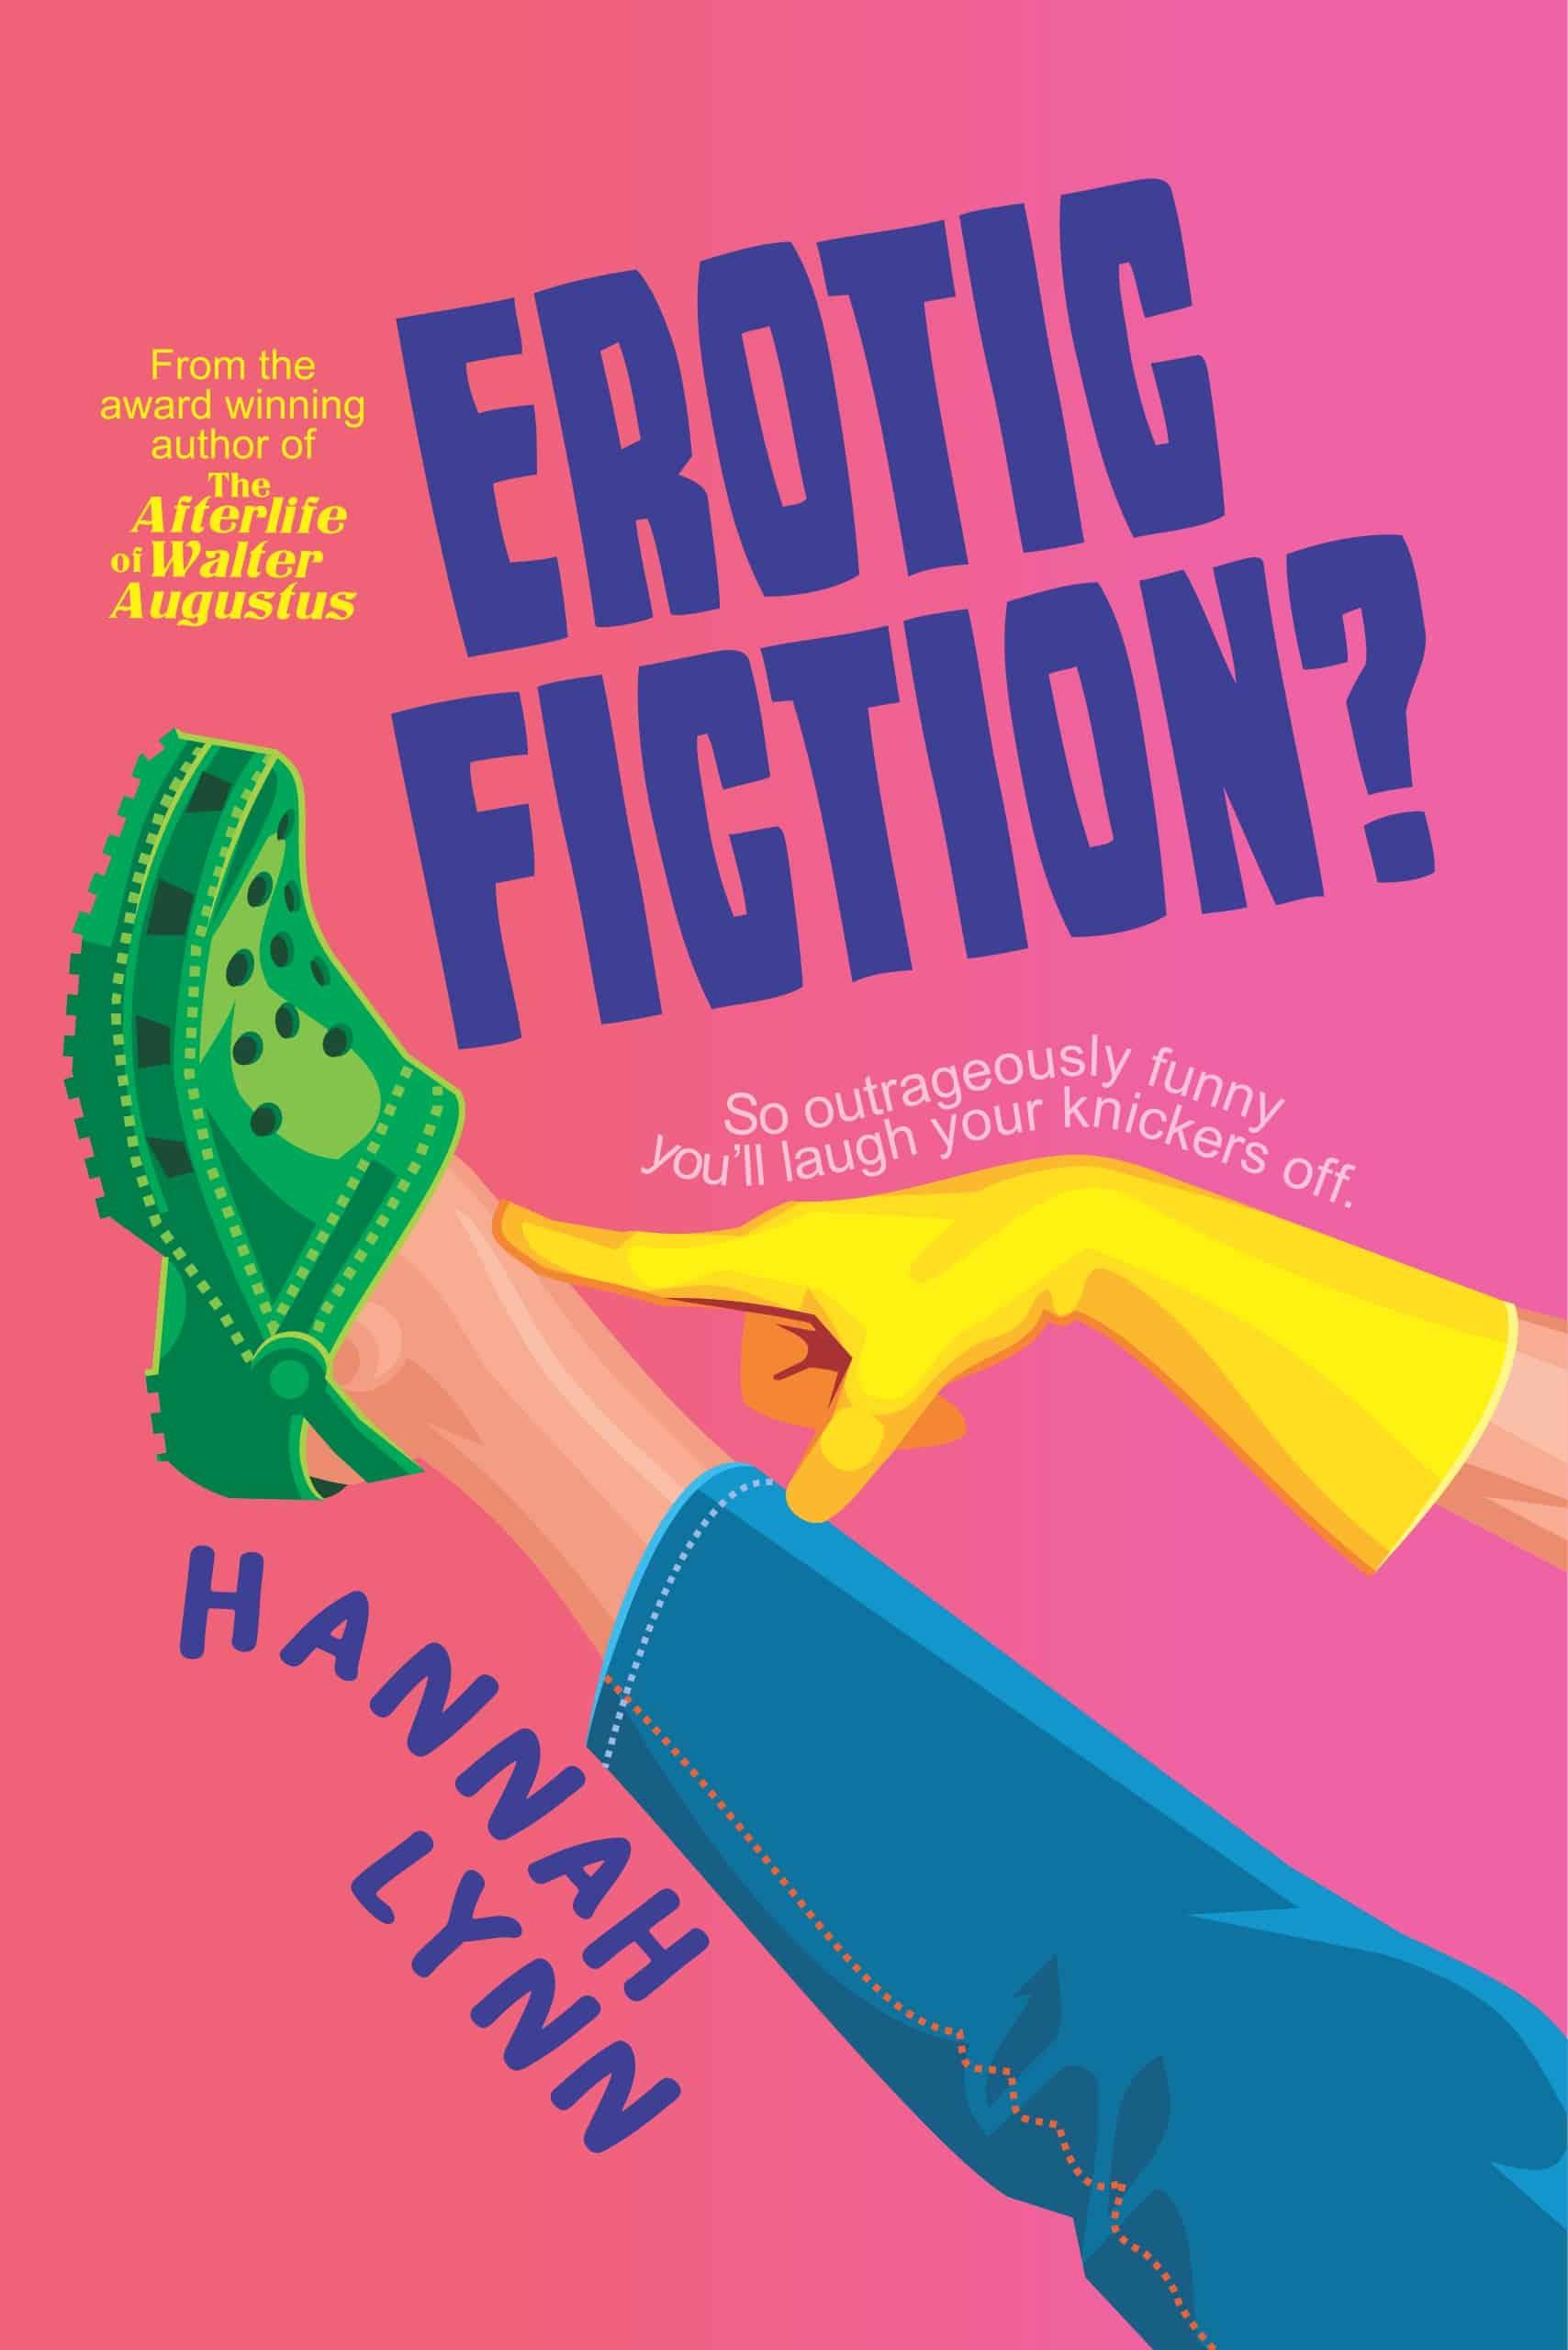 Erotic Fiction?